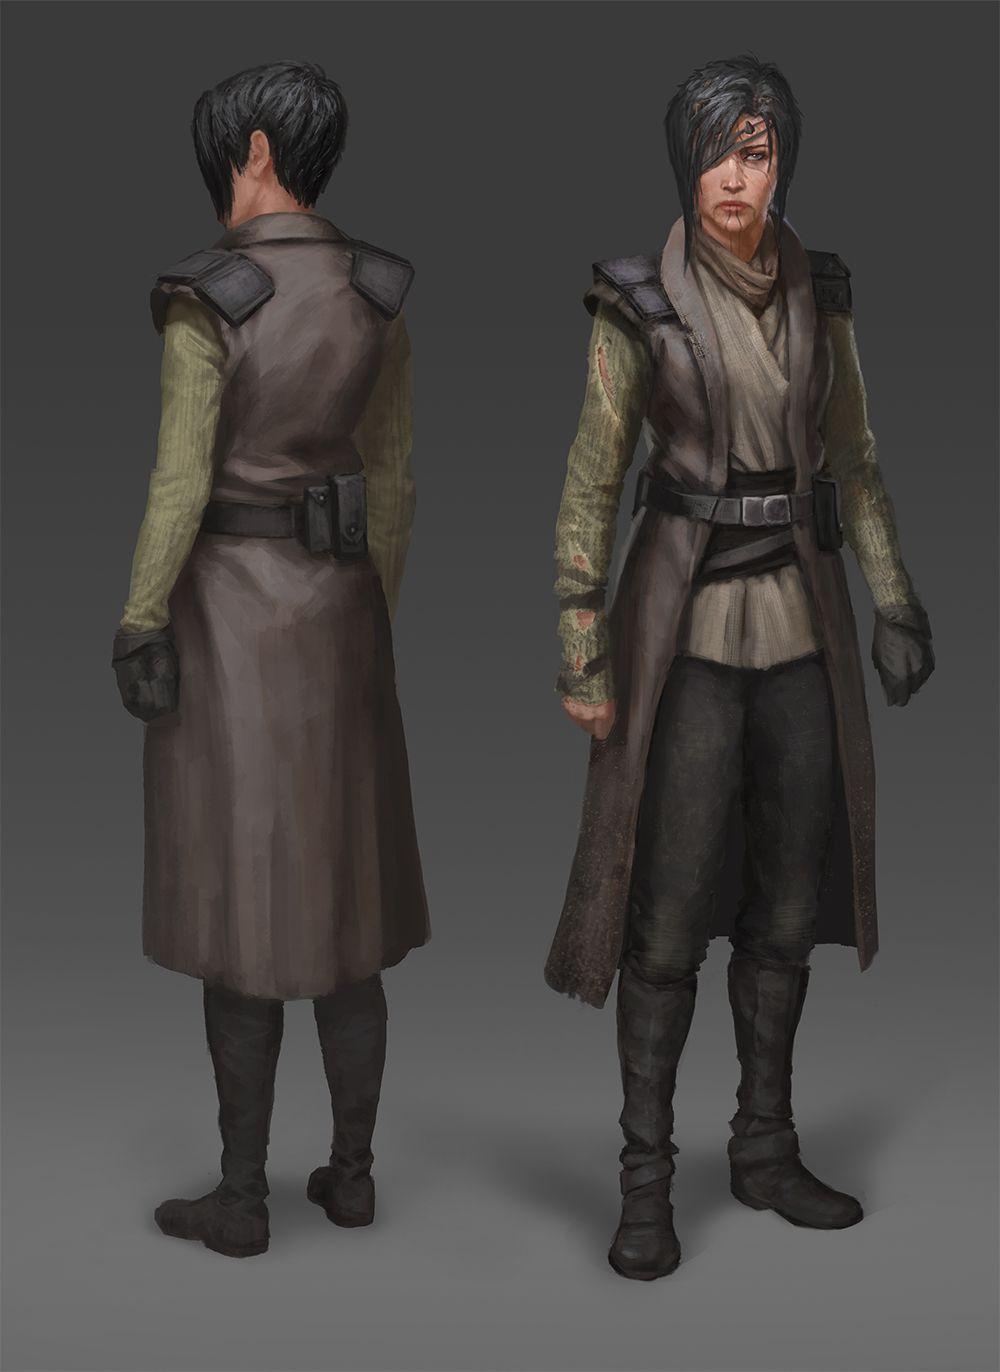 Star Wars Character Concept Art